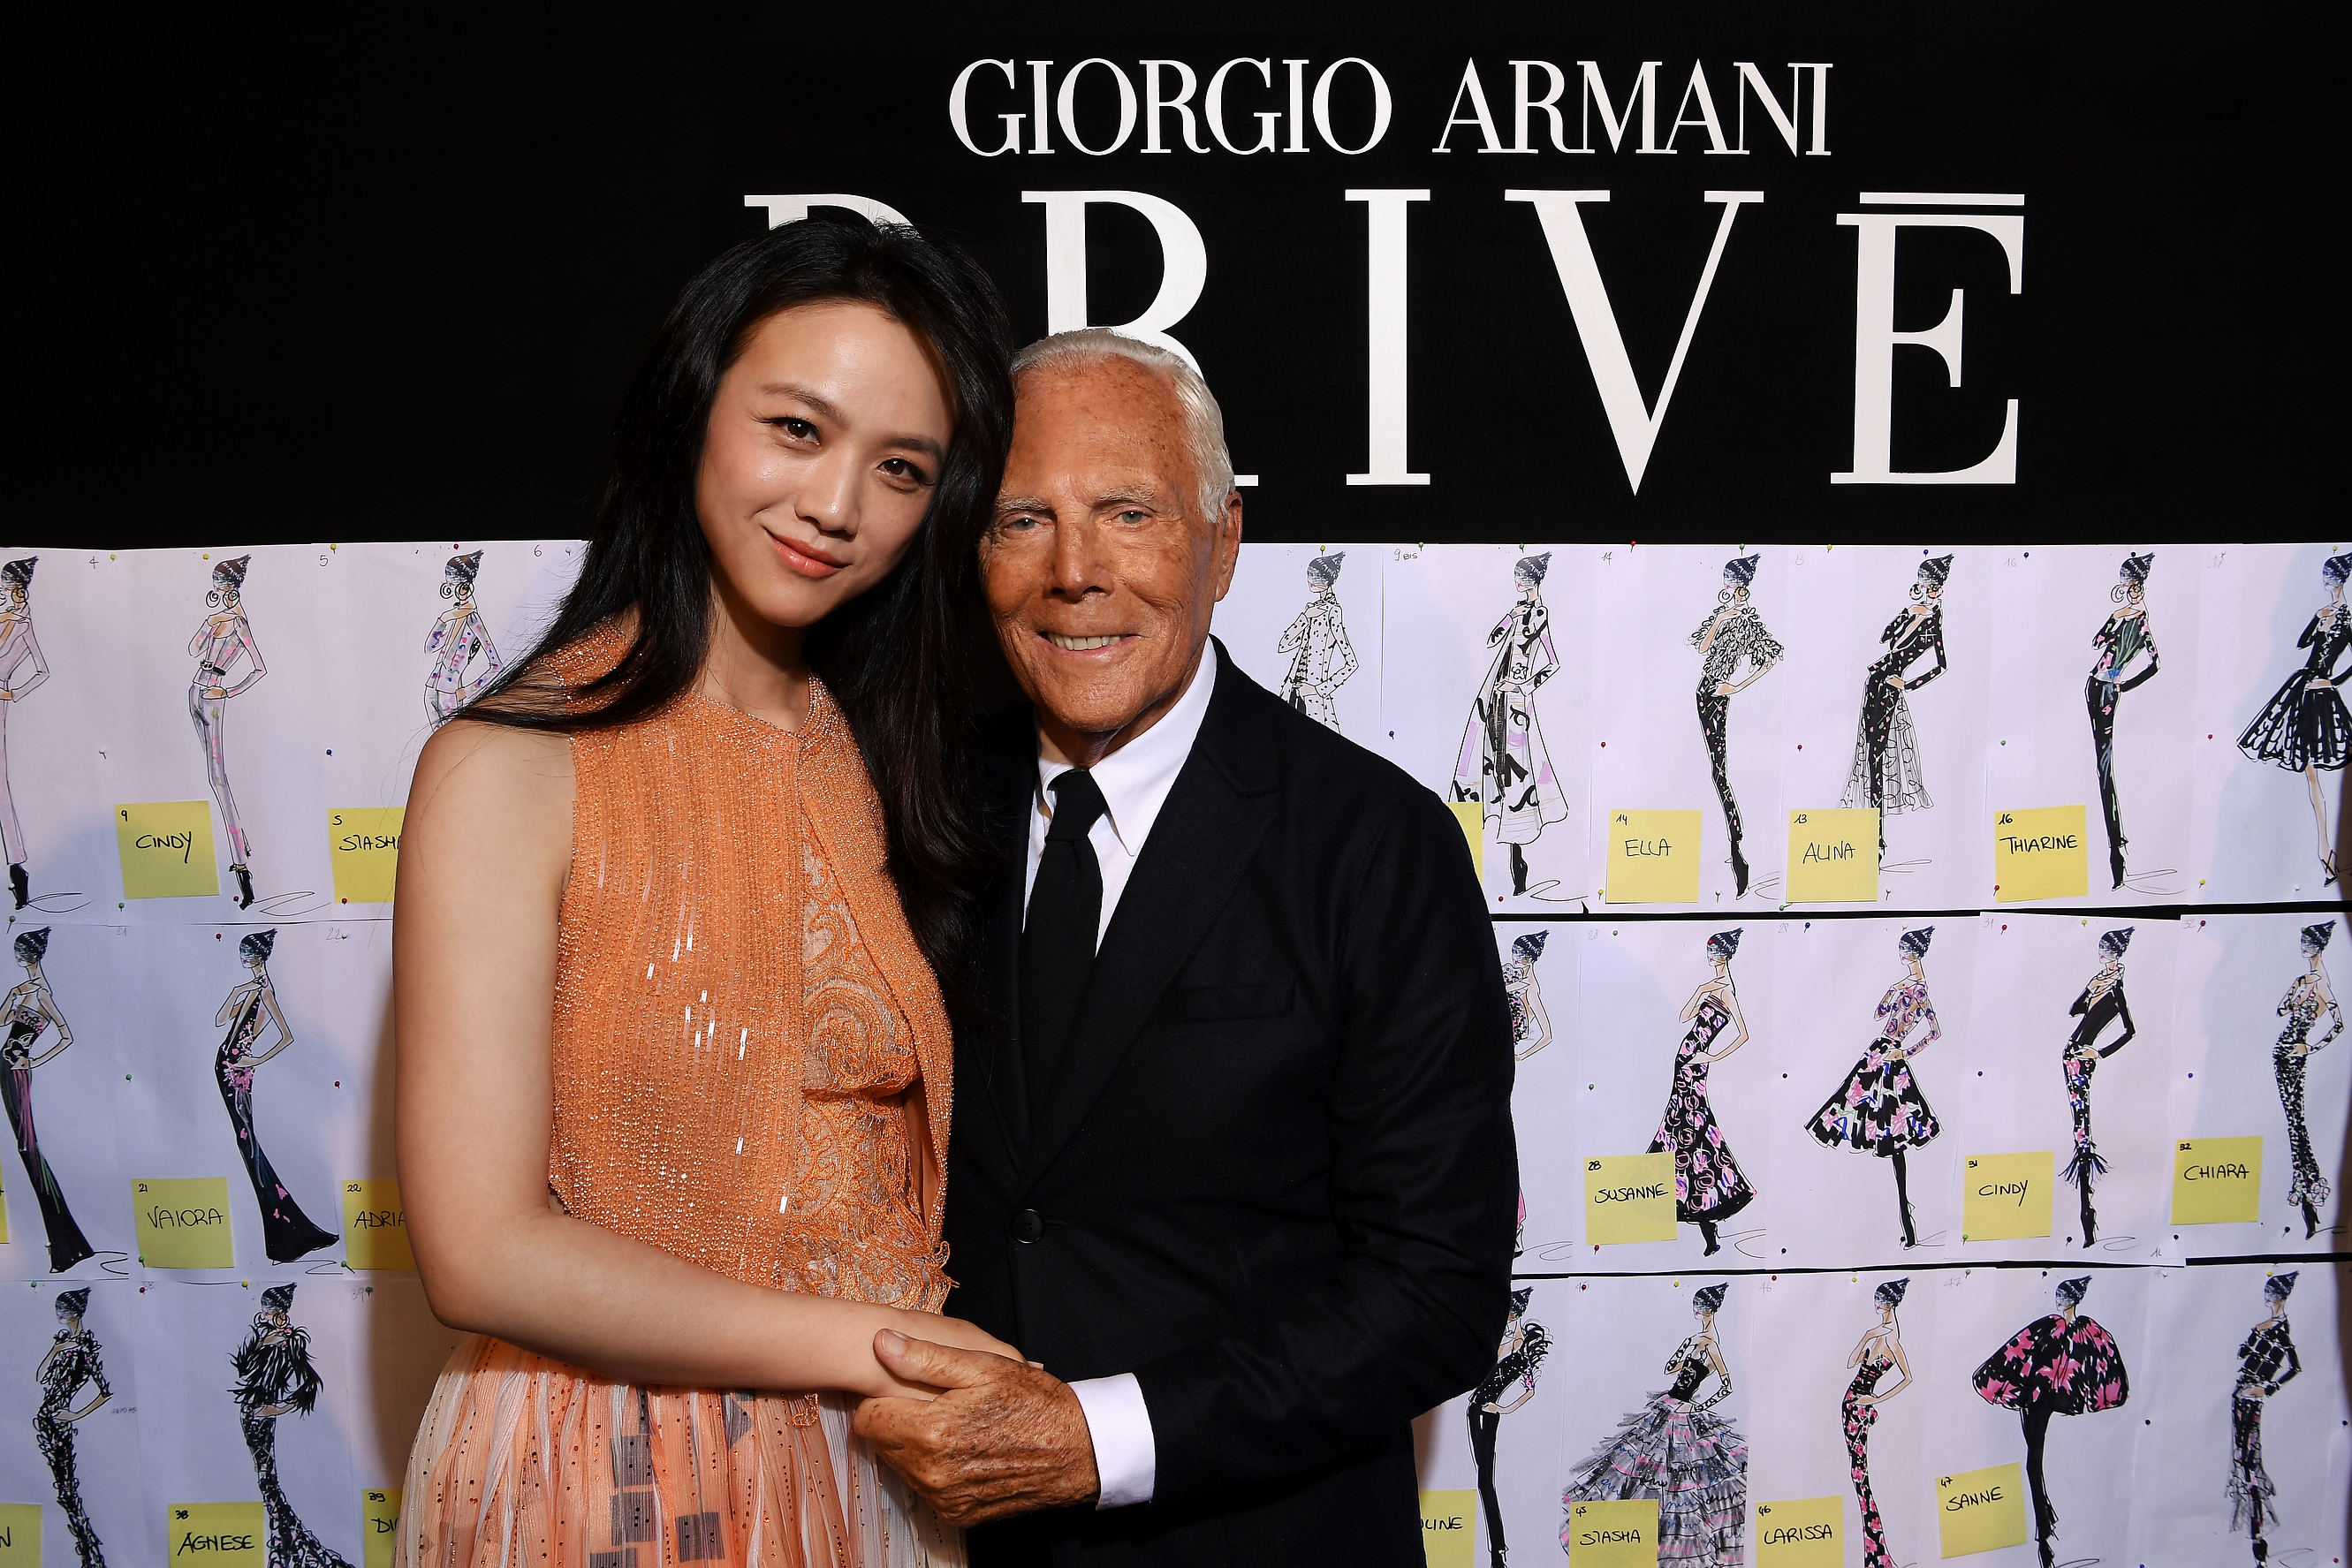 tang-wei-and-giorgio-armani_sgp